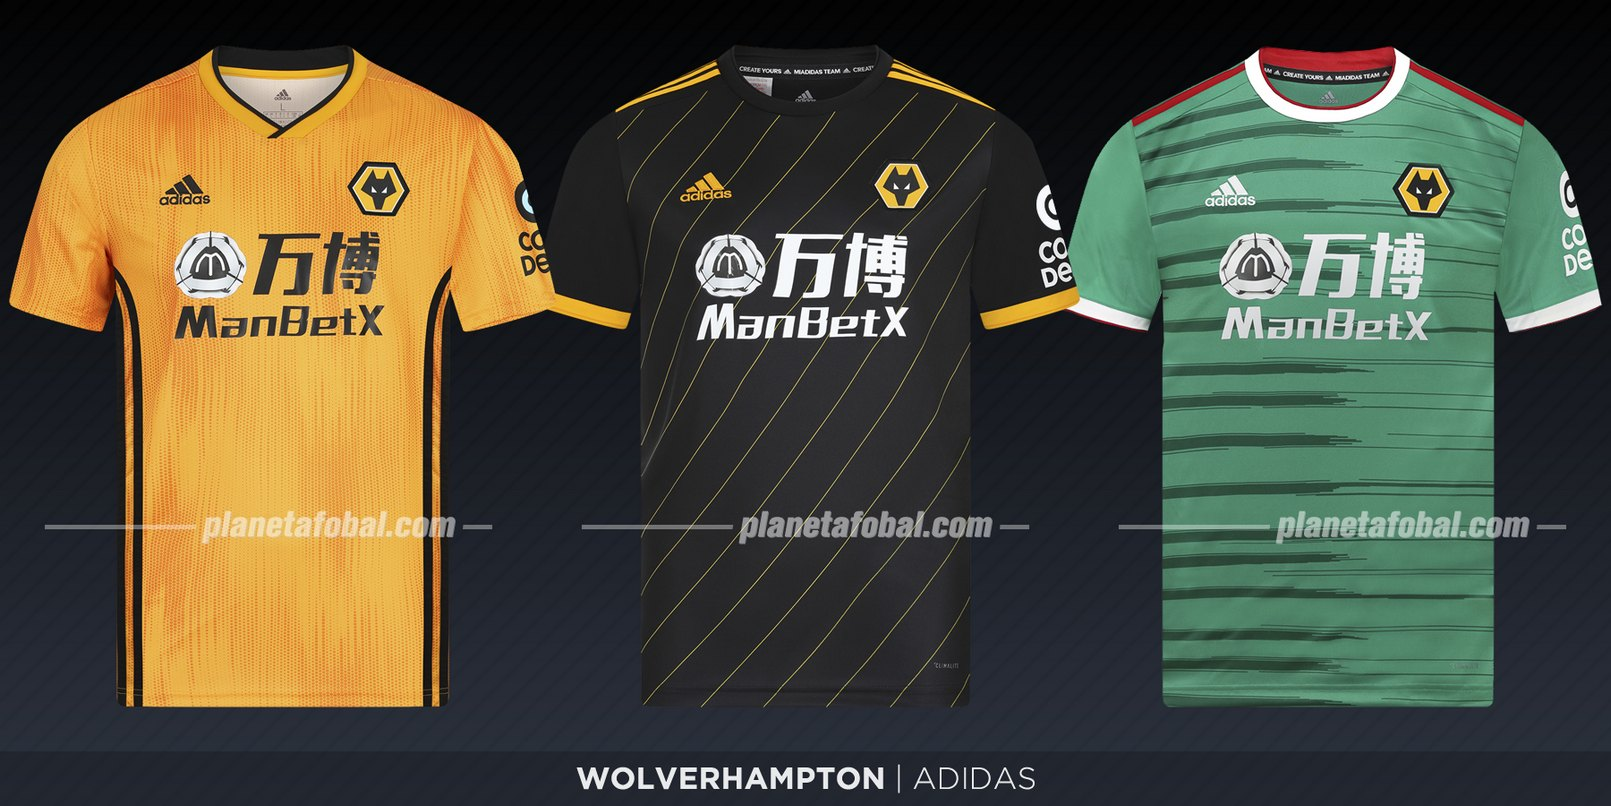 Wolverhamtpon (Adidas) | Camisetas de la Premier League 2019-2020